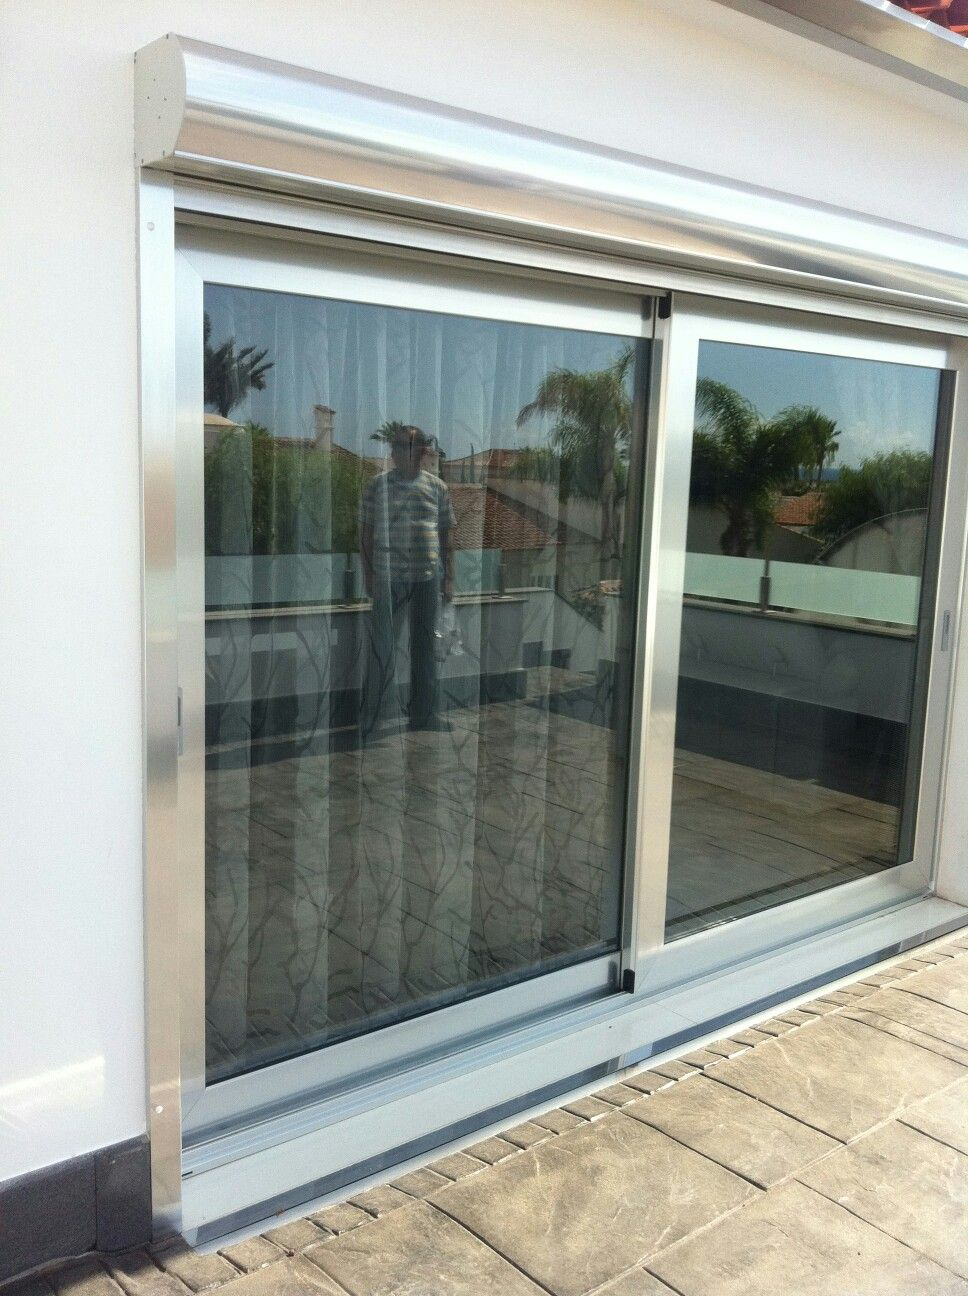 Puertas de aluminio de corredera elebable y cristal de - Persiana enrollable exterior ...